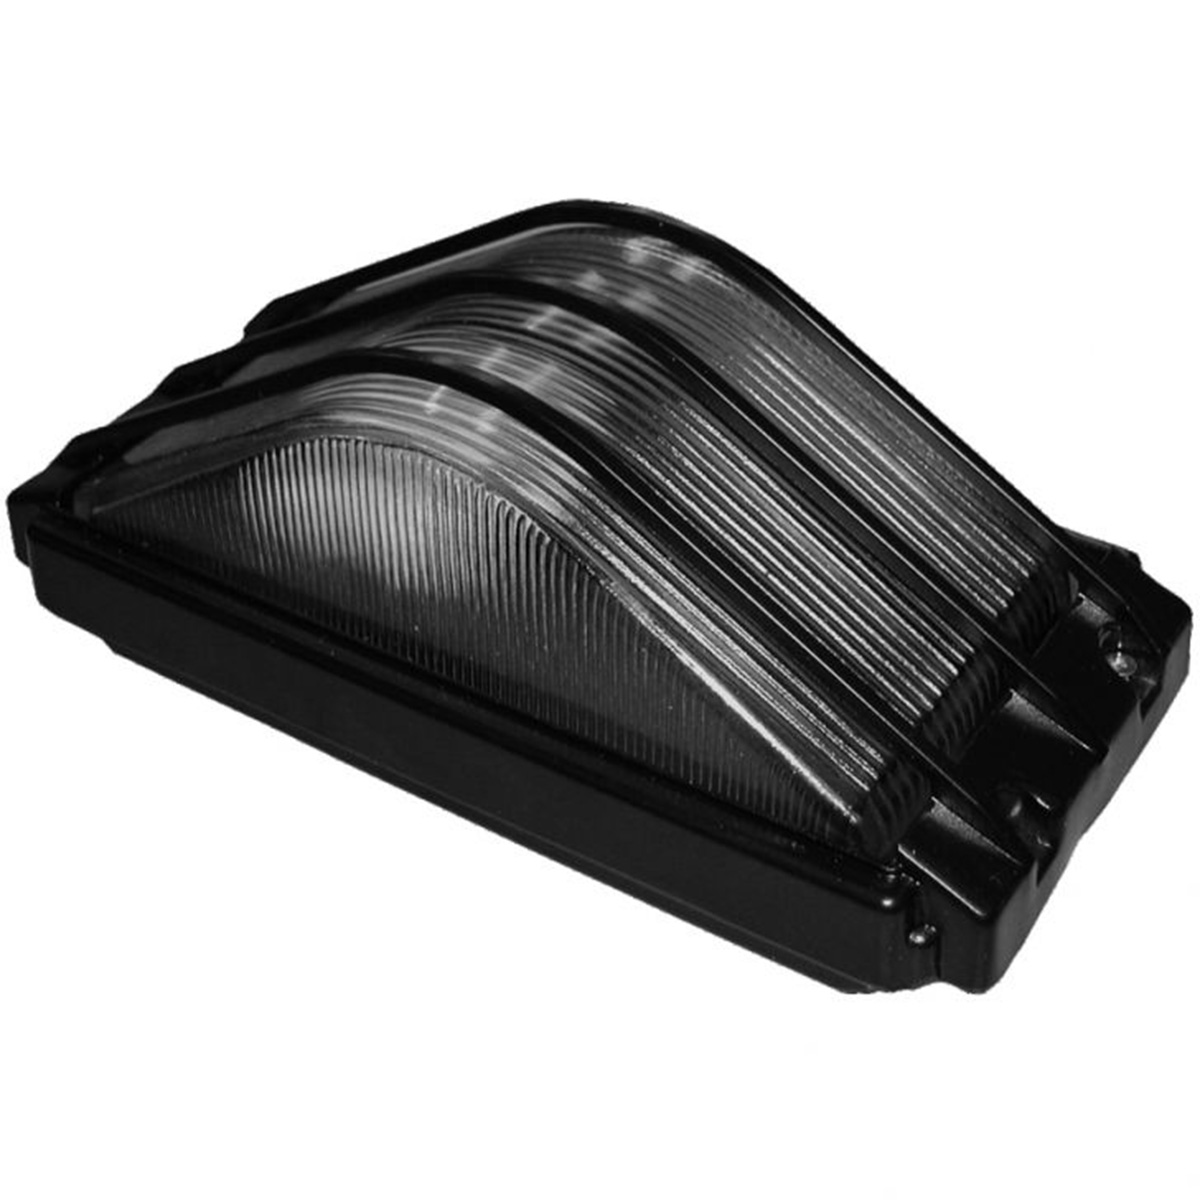 Tartaruga Piramide Retang. 21cm Aluminio Pint. Epoxi E-27 1 Lamp. Max 60w Preta